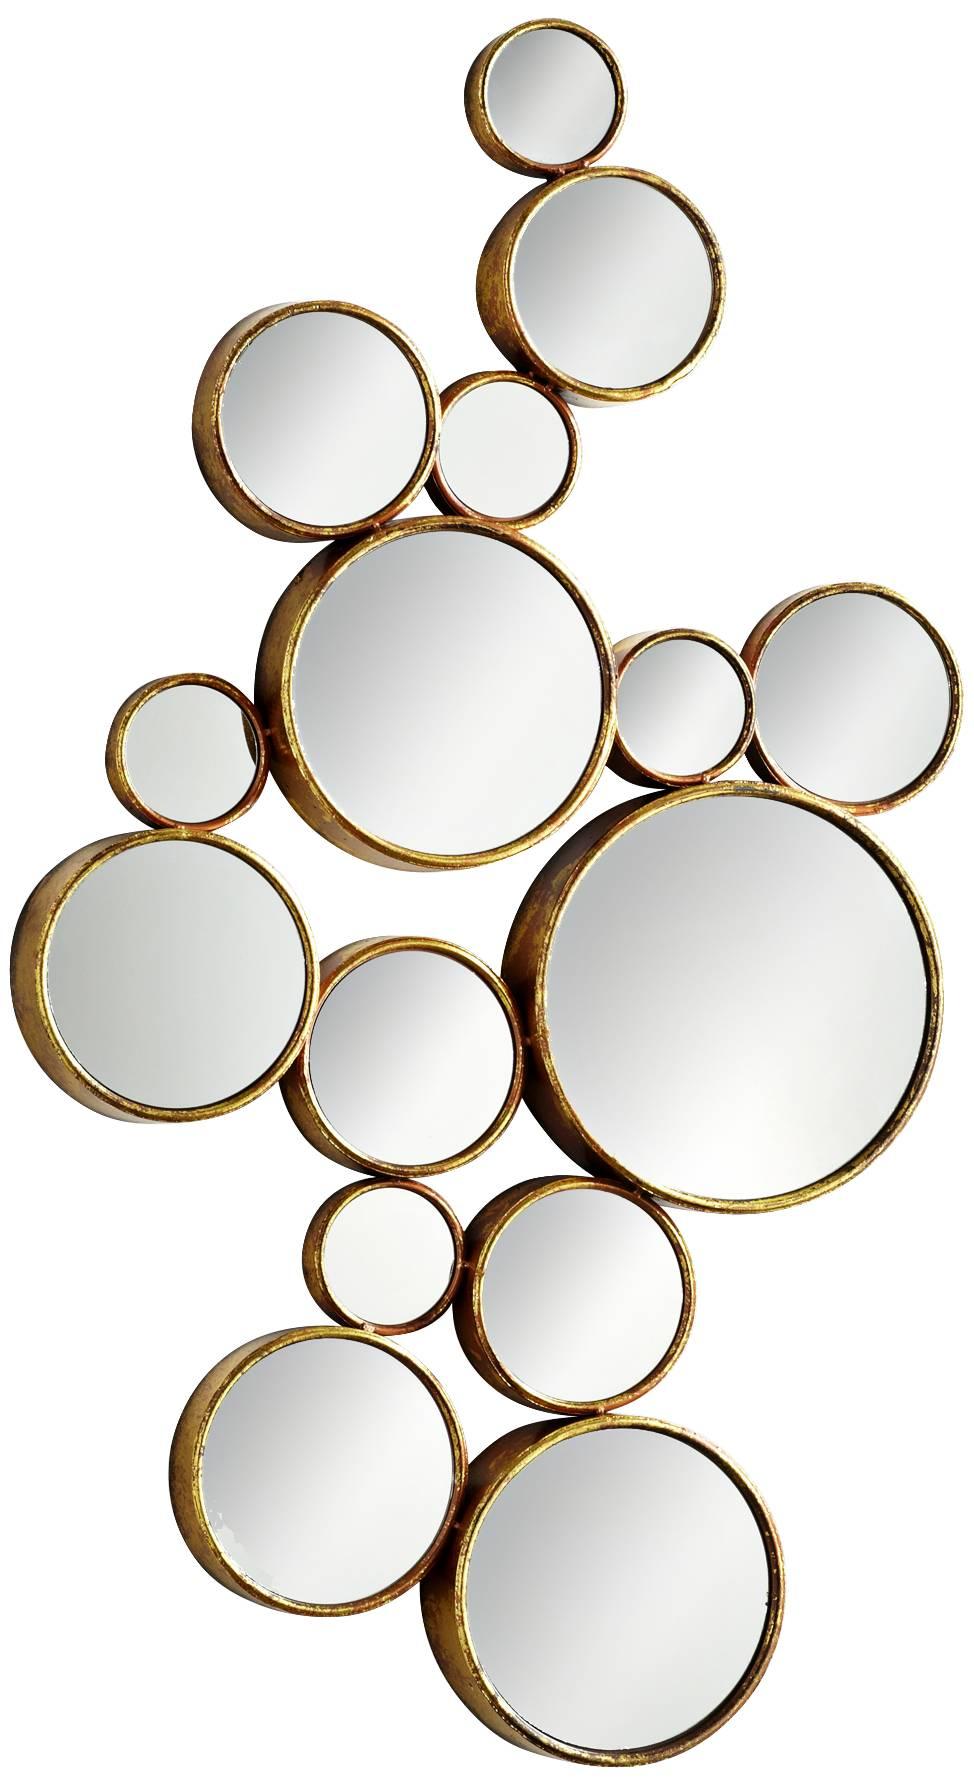 Ayden 24 Quot X 24 Quot Frameless Wall Mirror 6x667 Lamps Plus